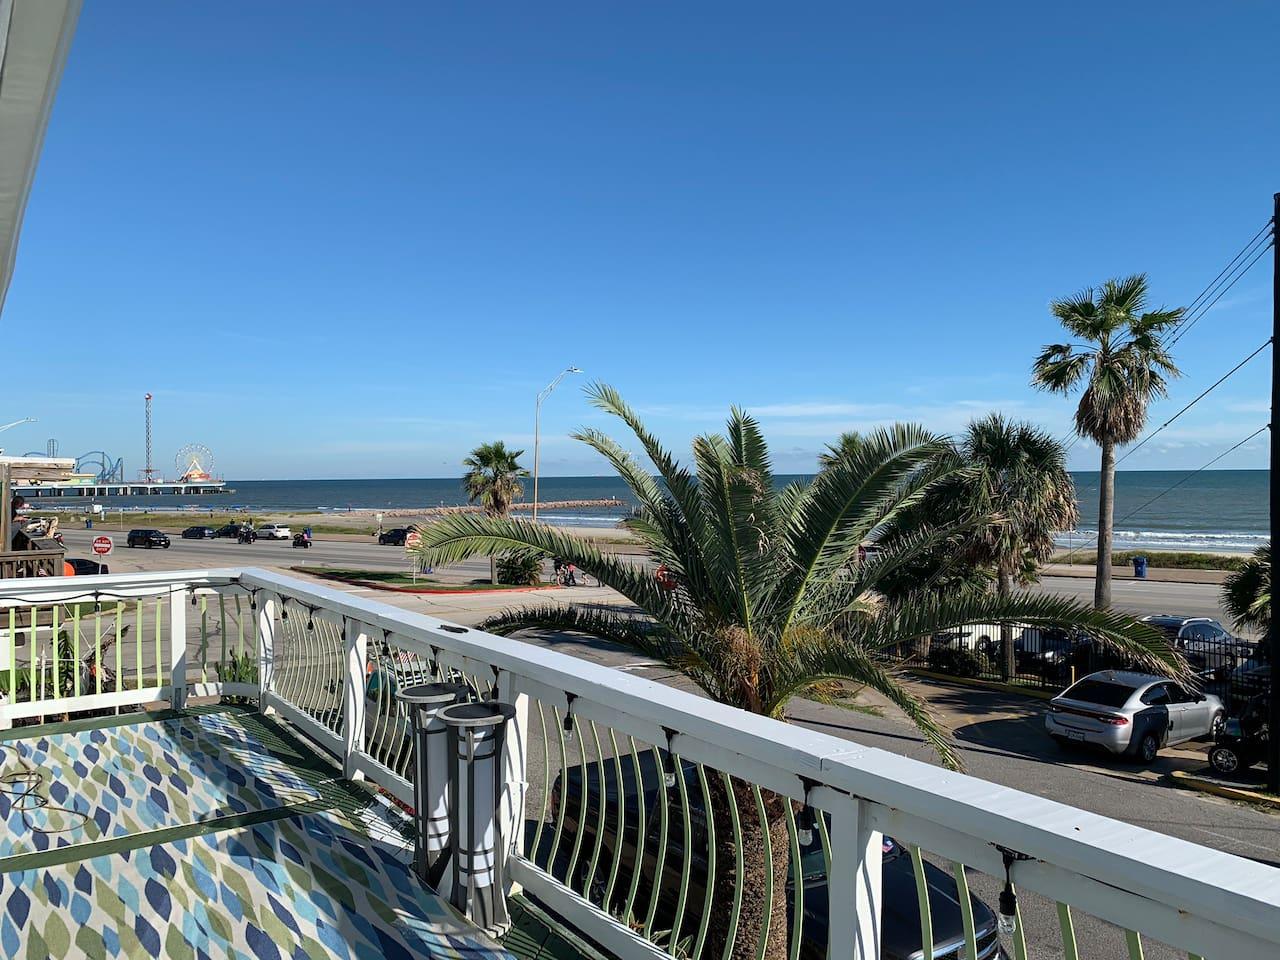 Luxury-Airbnb-Galveston-Beach-Home